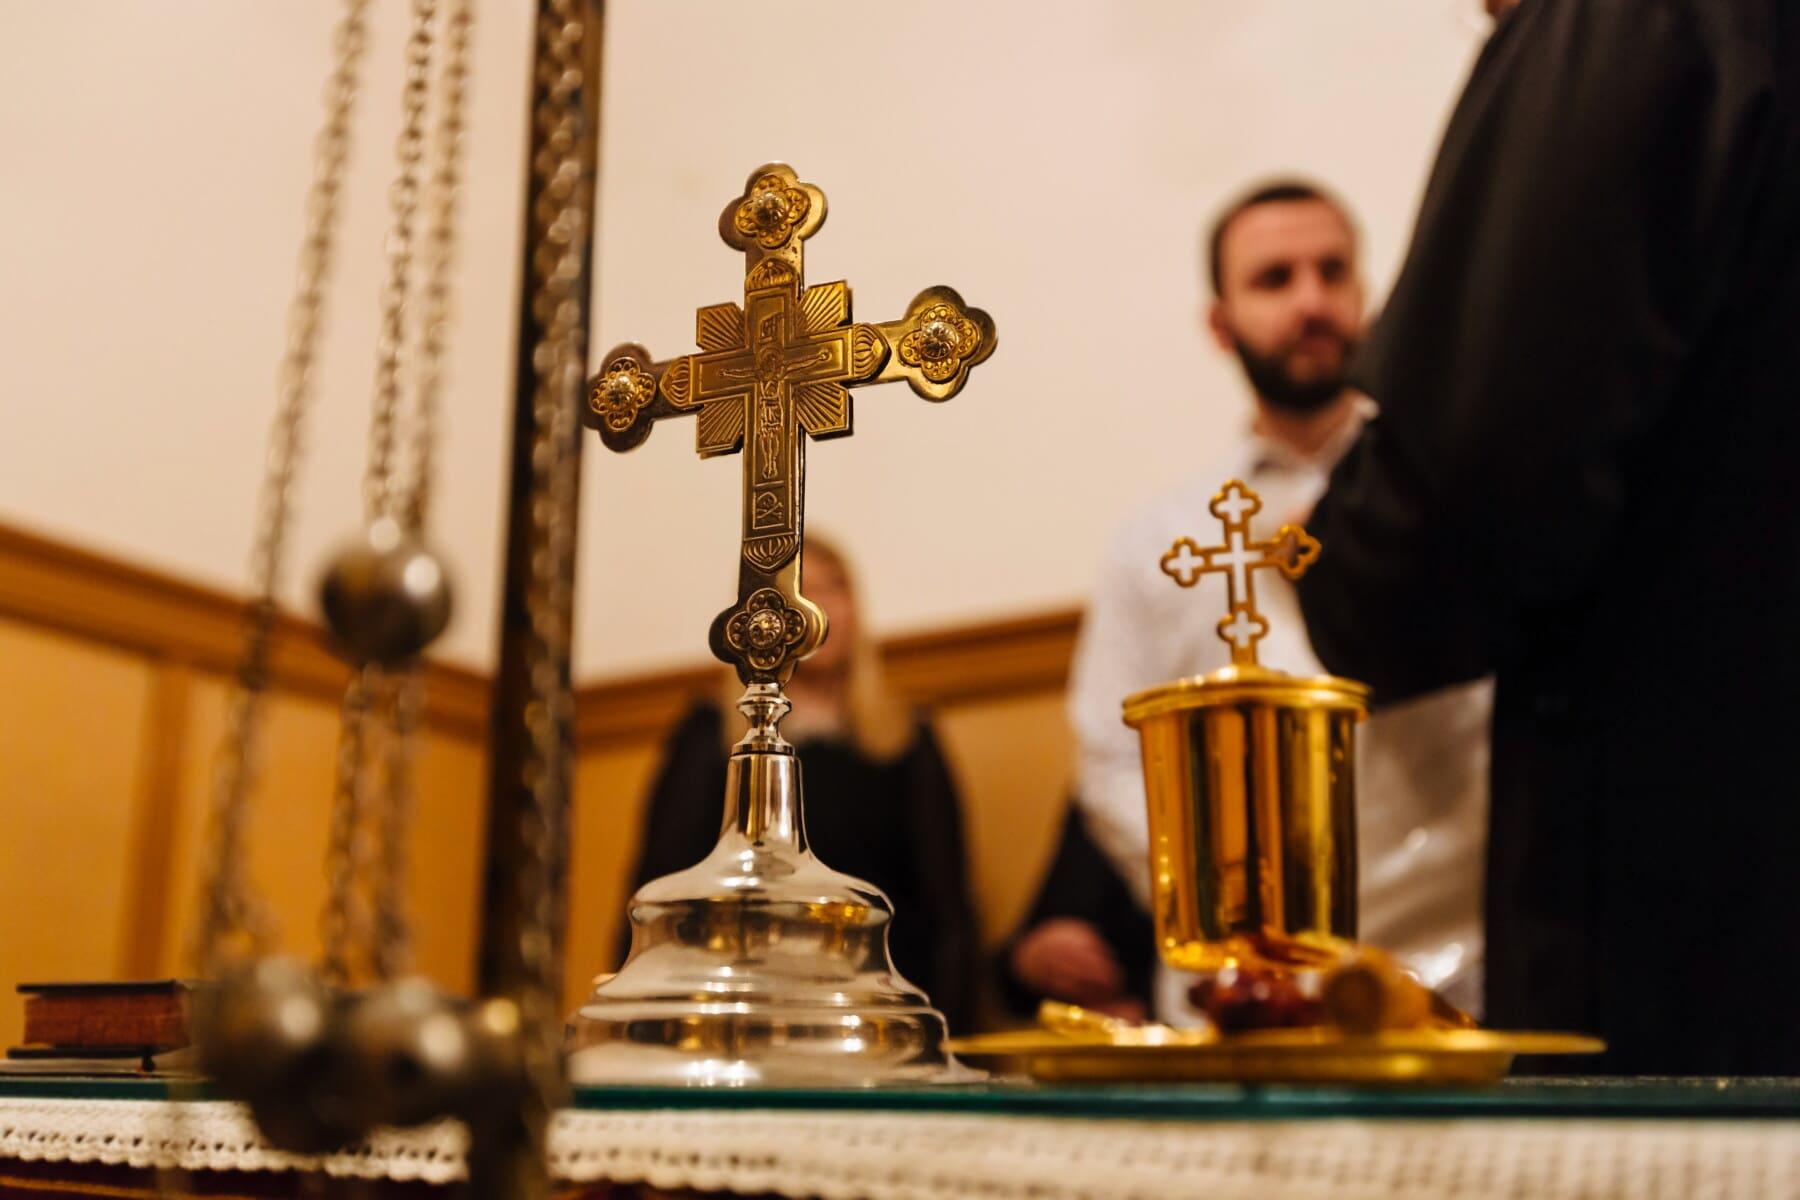 religion, golden shine, cross, priest, church, brass, indoors, spirituality, gold, prayer